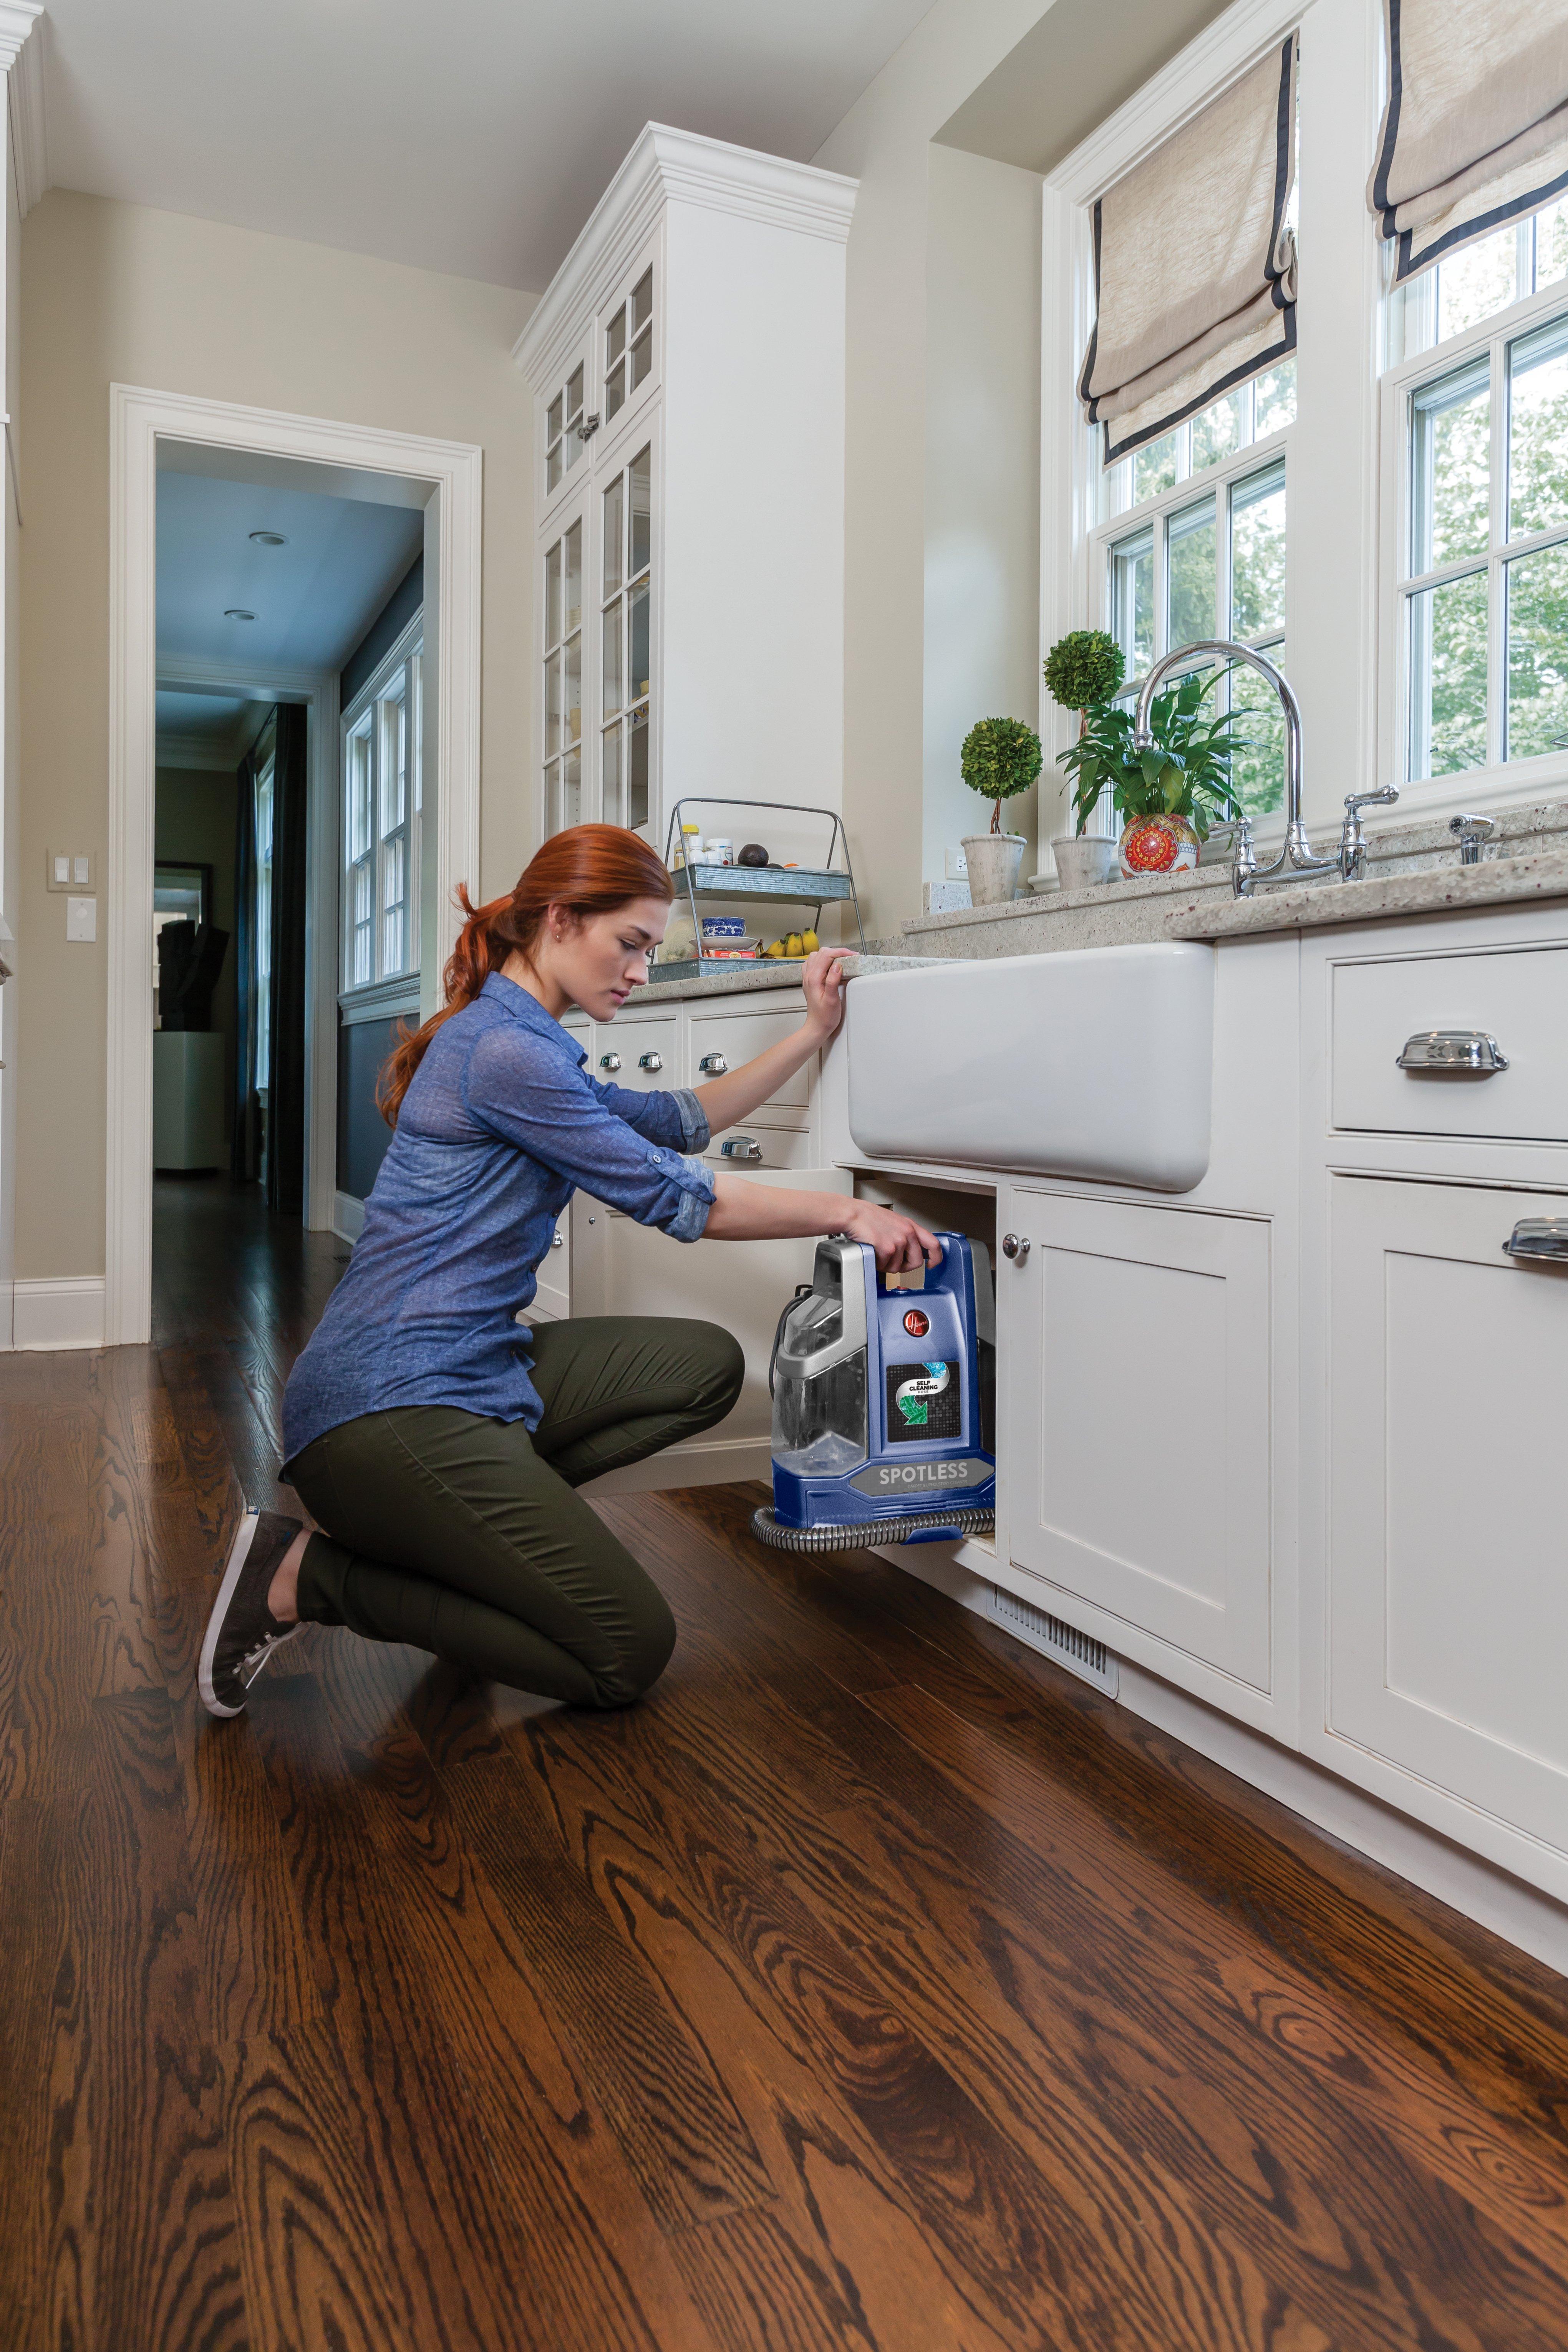 Spotless Portable Carpet & Upholstery Cleaner6